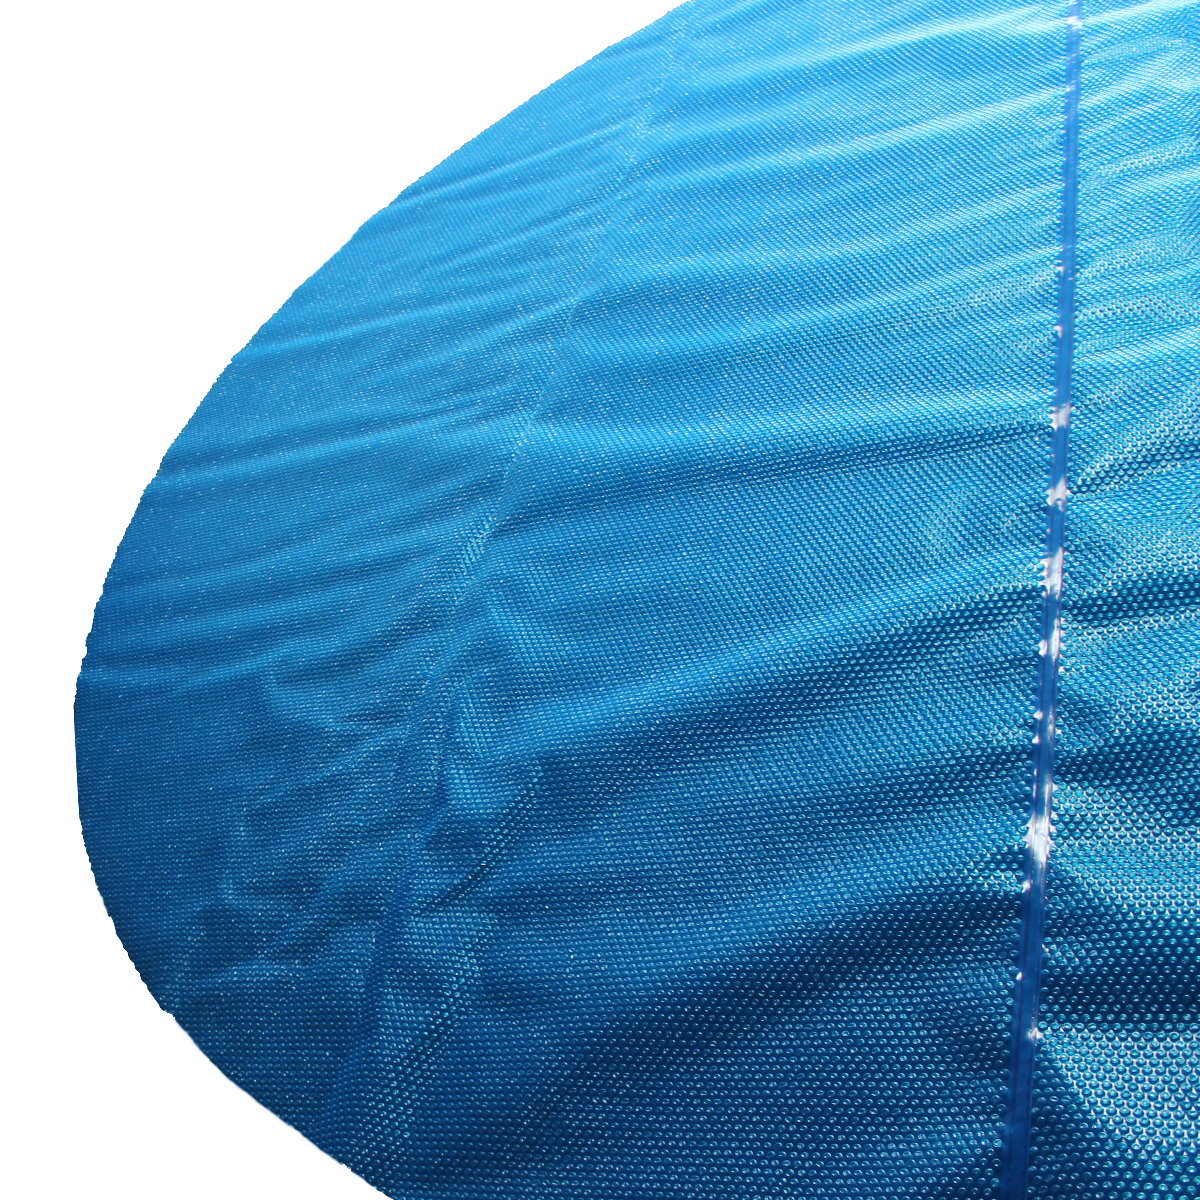 solarfolie duraol blau 400my f r ovalformbecken pool. Black Bedroom Furniture Sets. Home Design Ideas